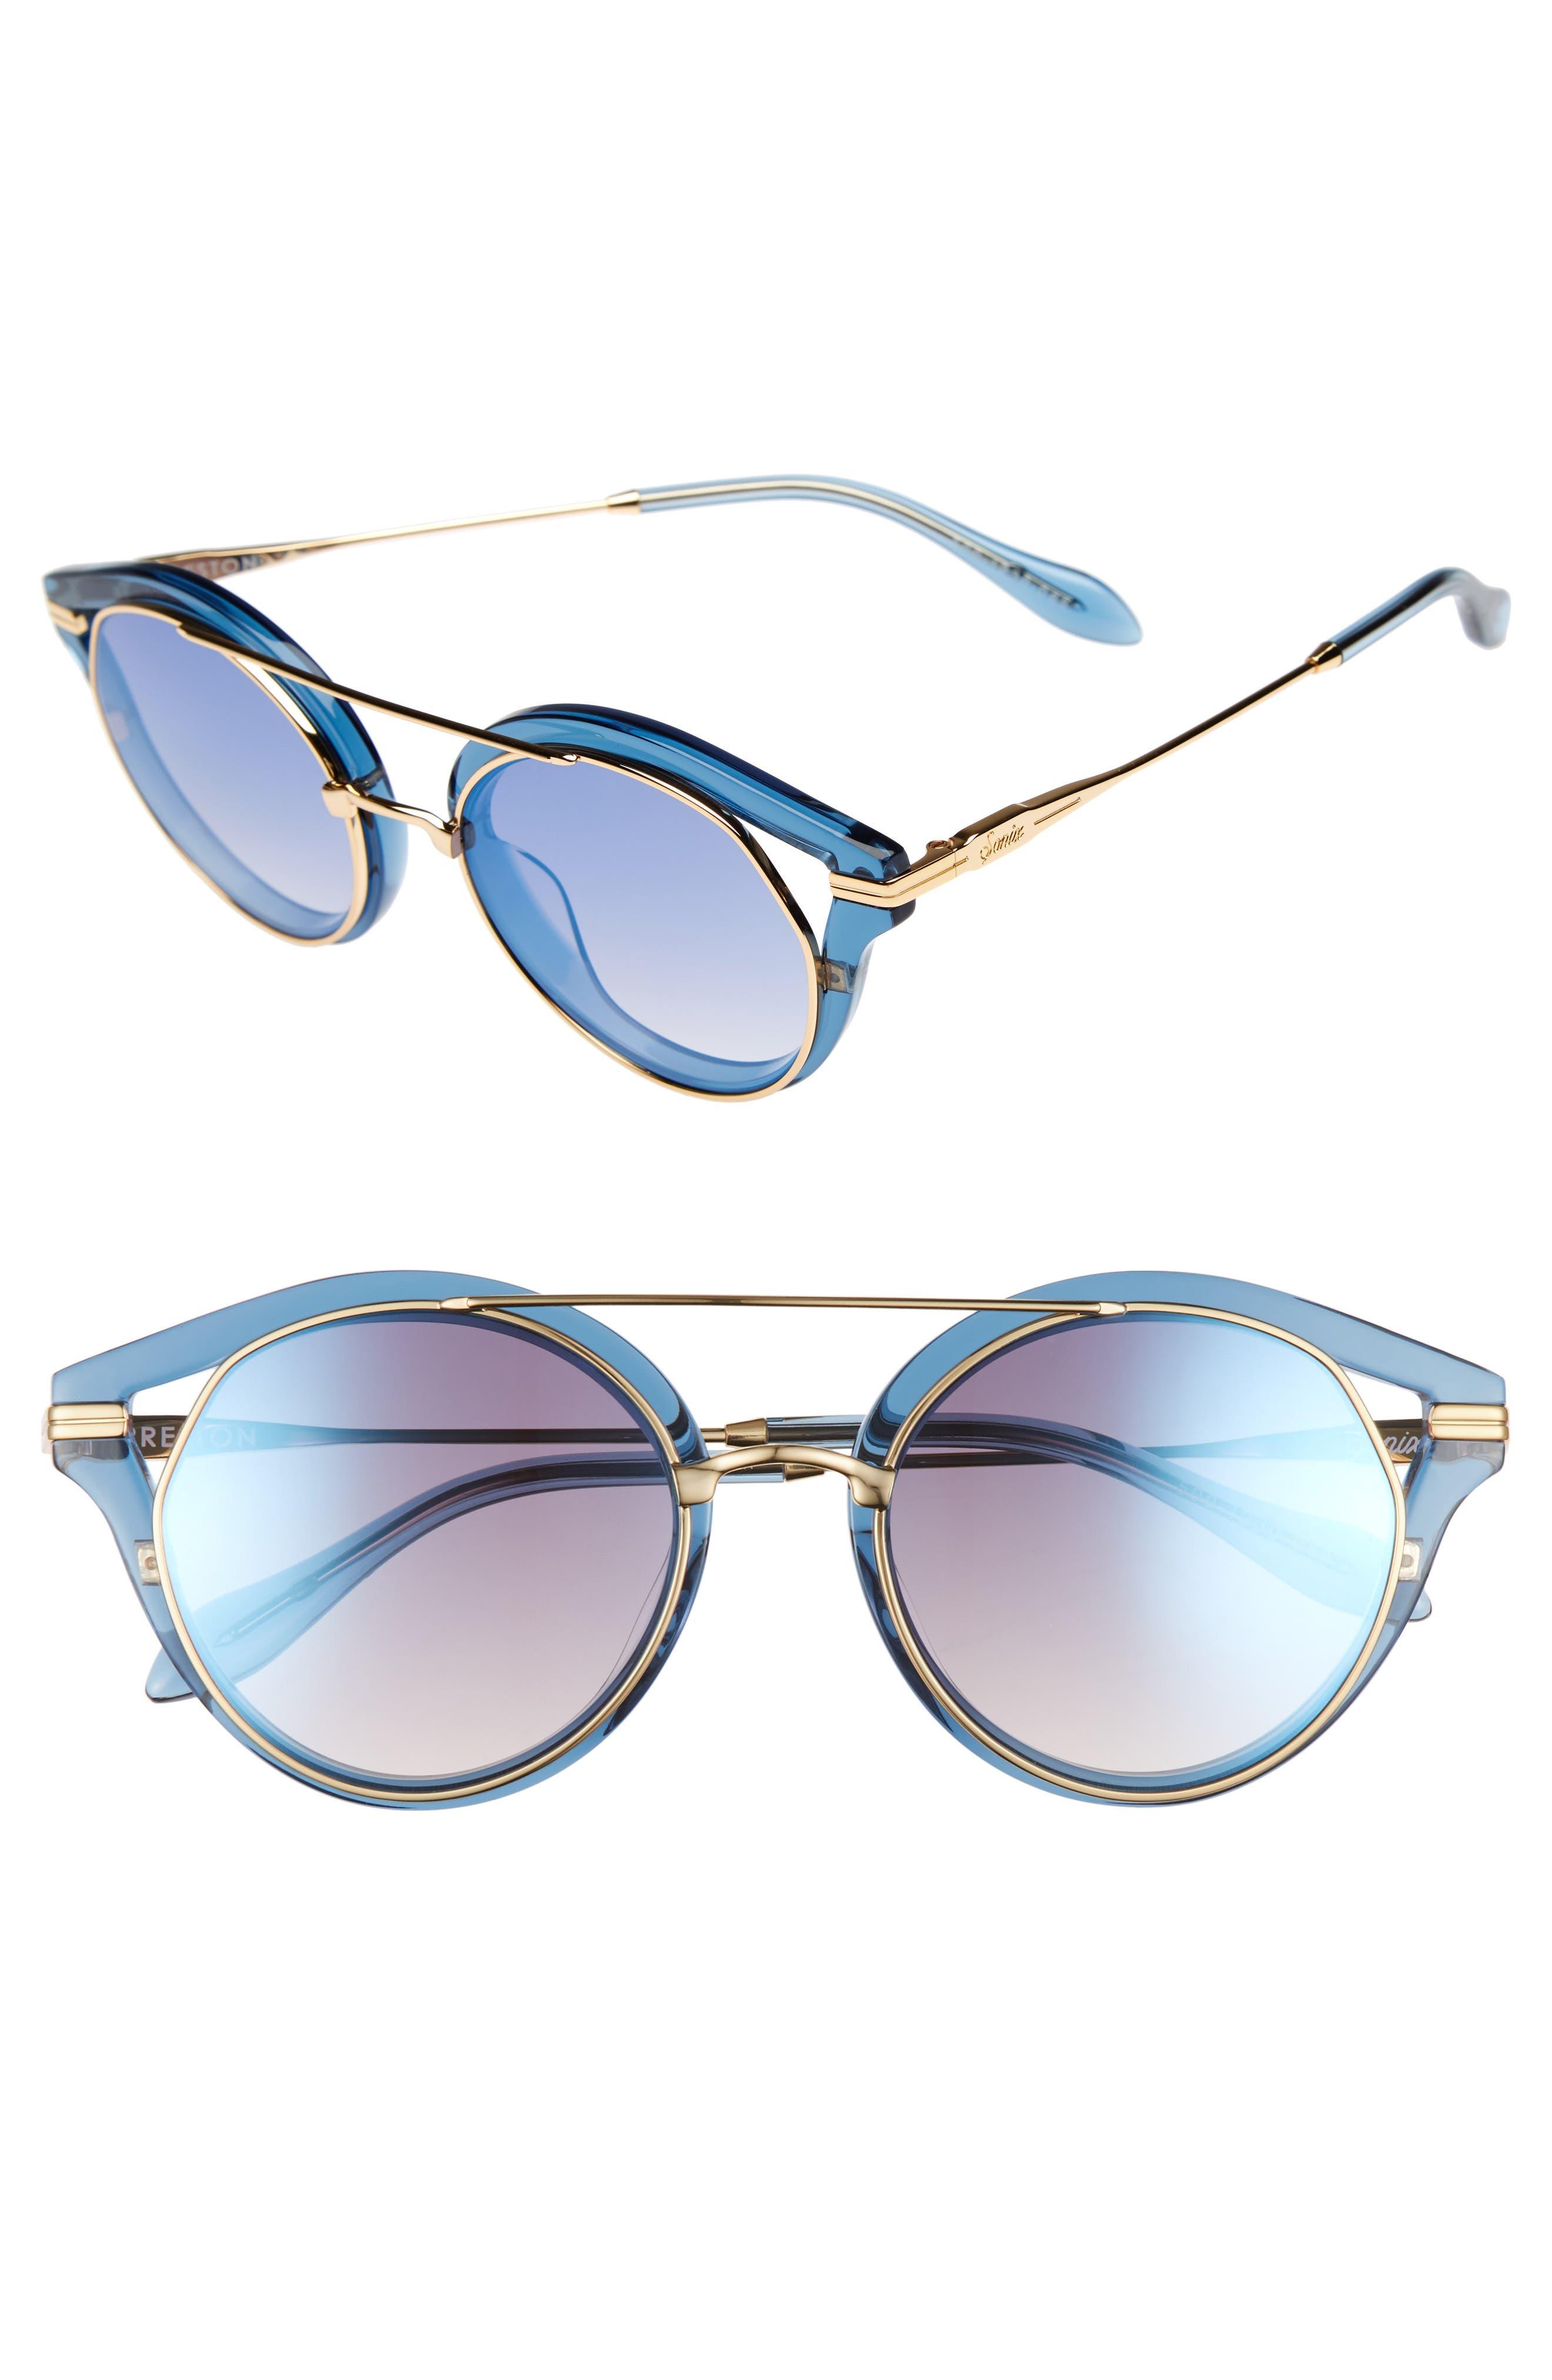 Alternate Image 1 Selected - Sonix Preston 51mm Gradient Round Sunglasses